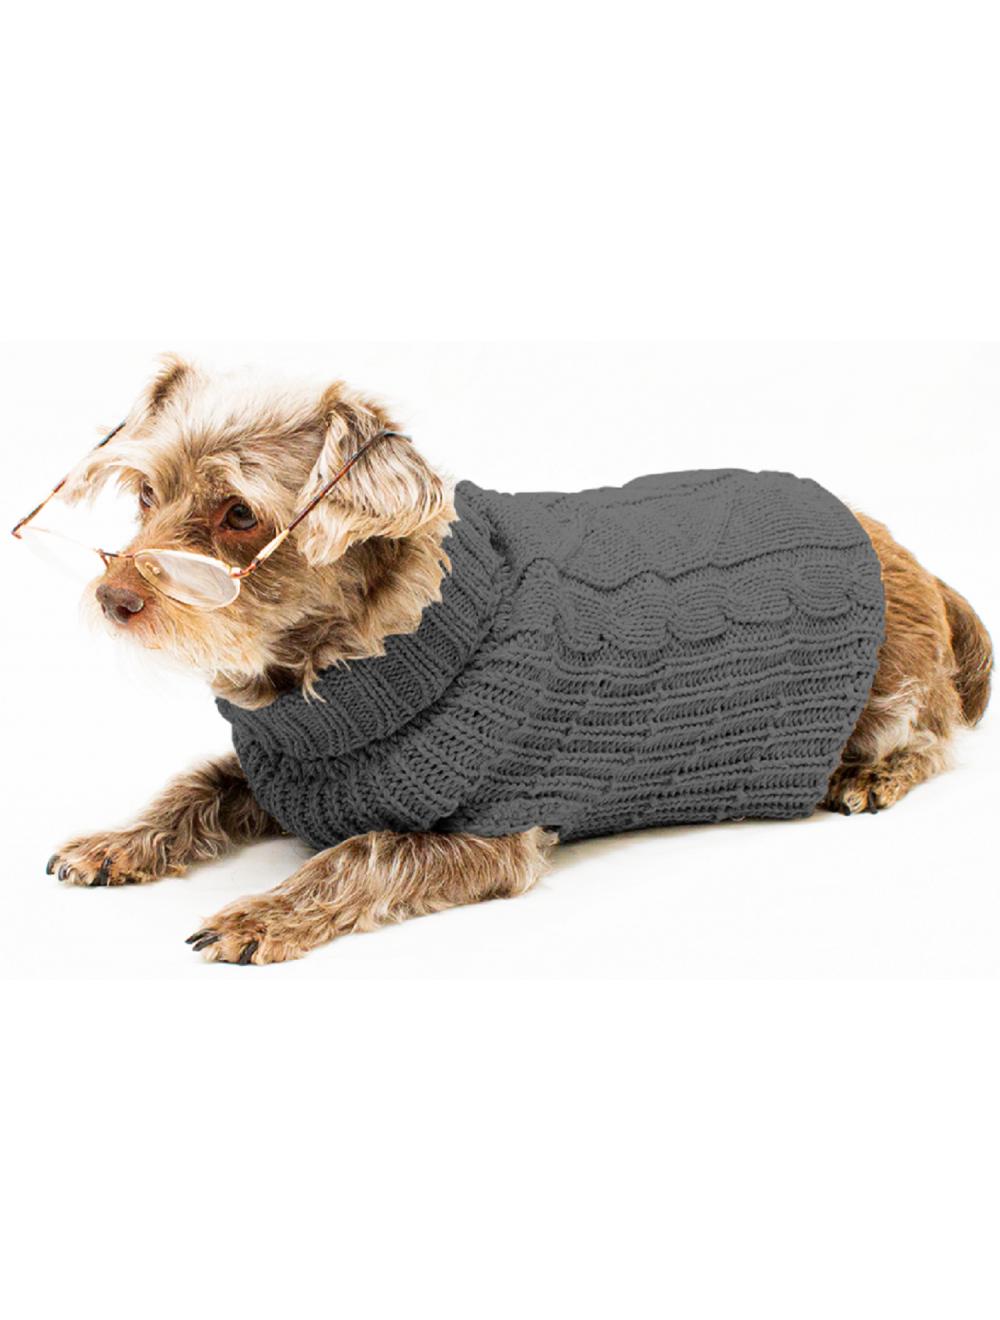 Ropa para perro Saco Cody talla XL - Ciudaddemascotas.